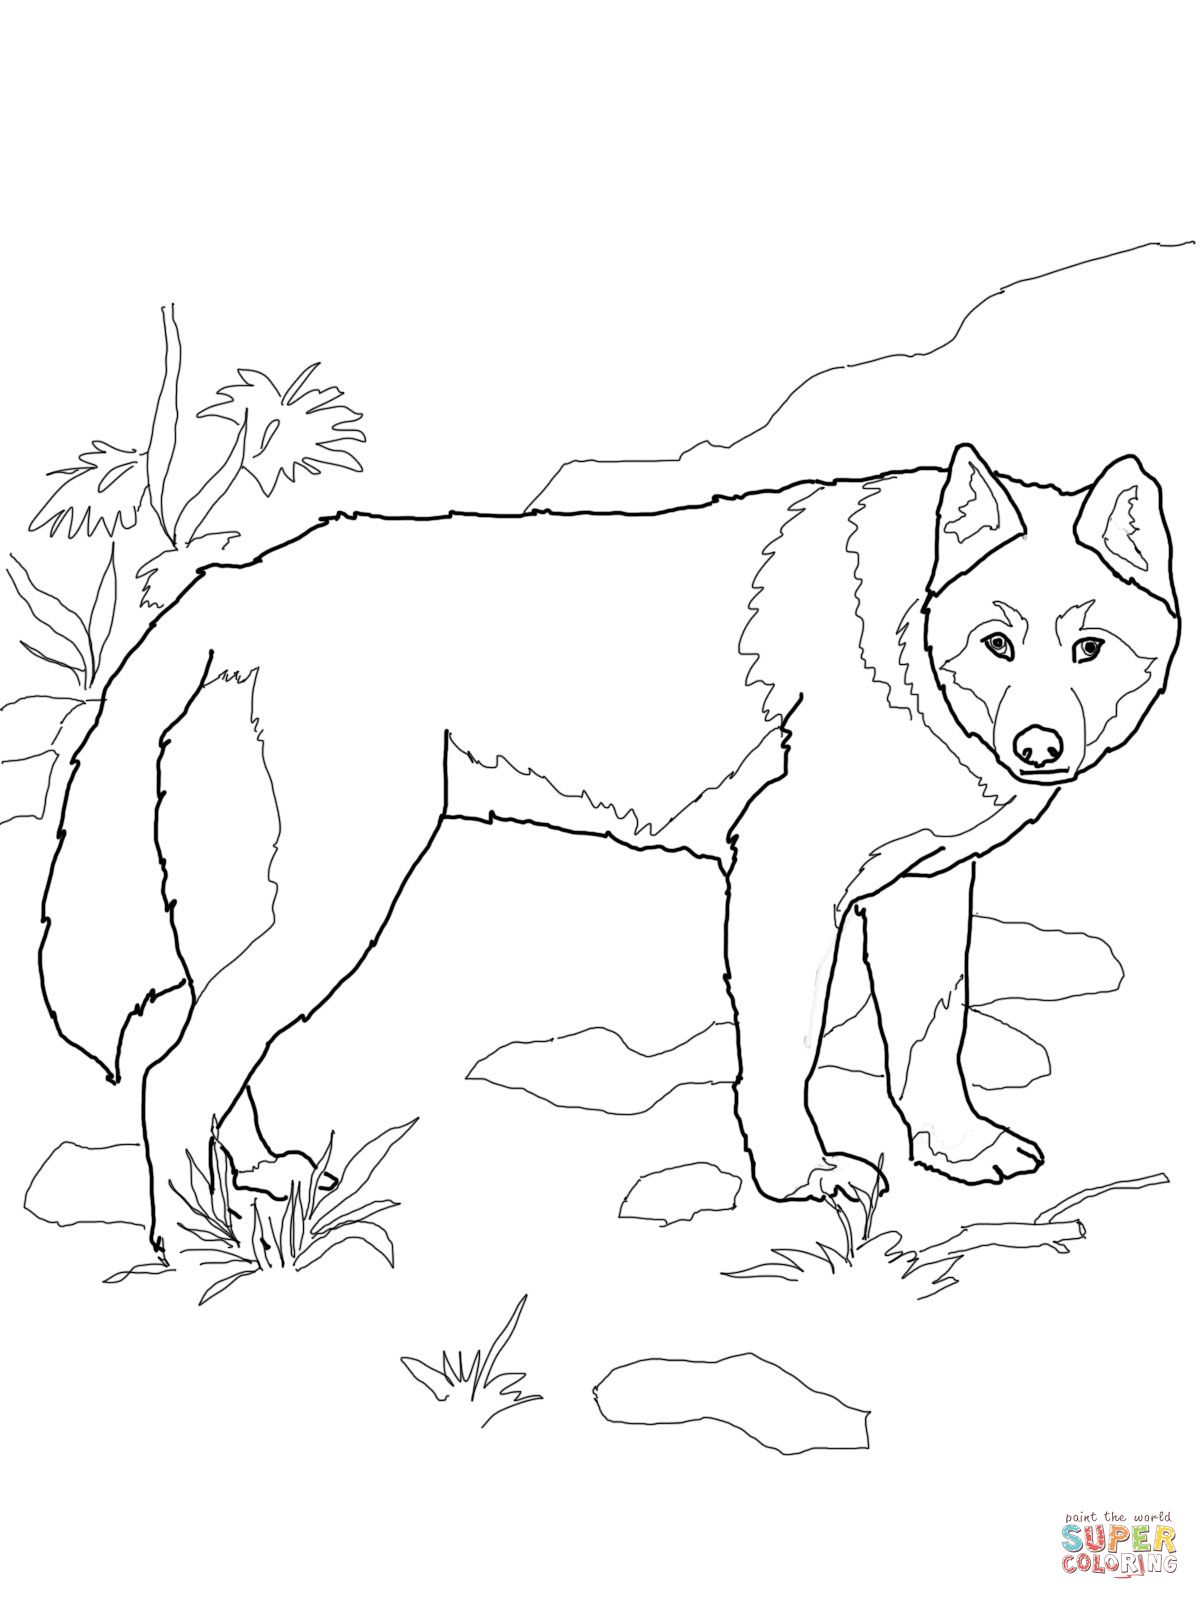 Dingo Wild Dog Coloring Page Supercoloring Com Dog Coloring